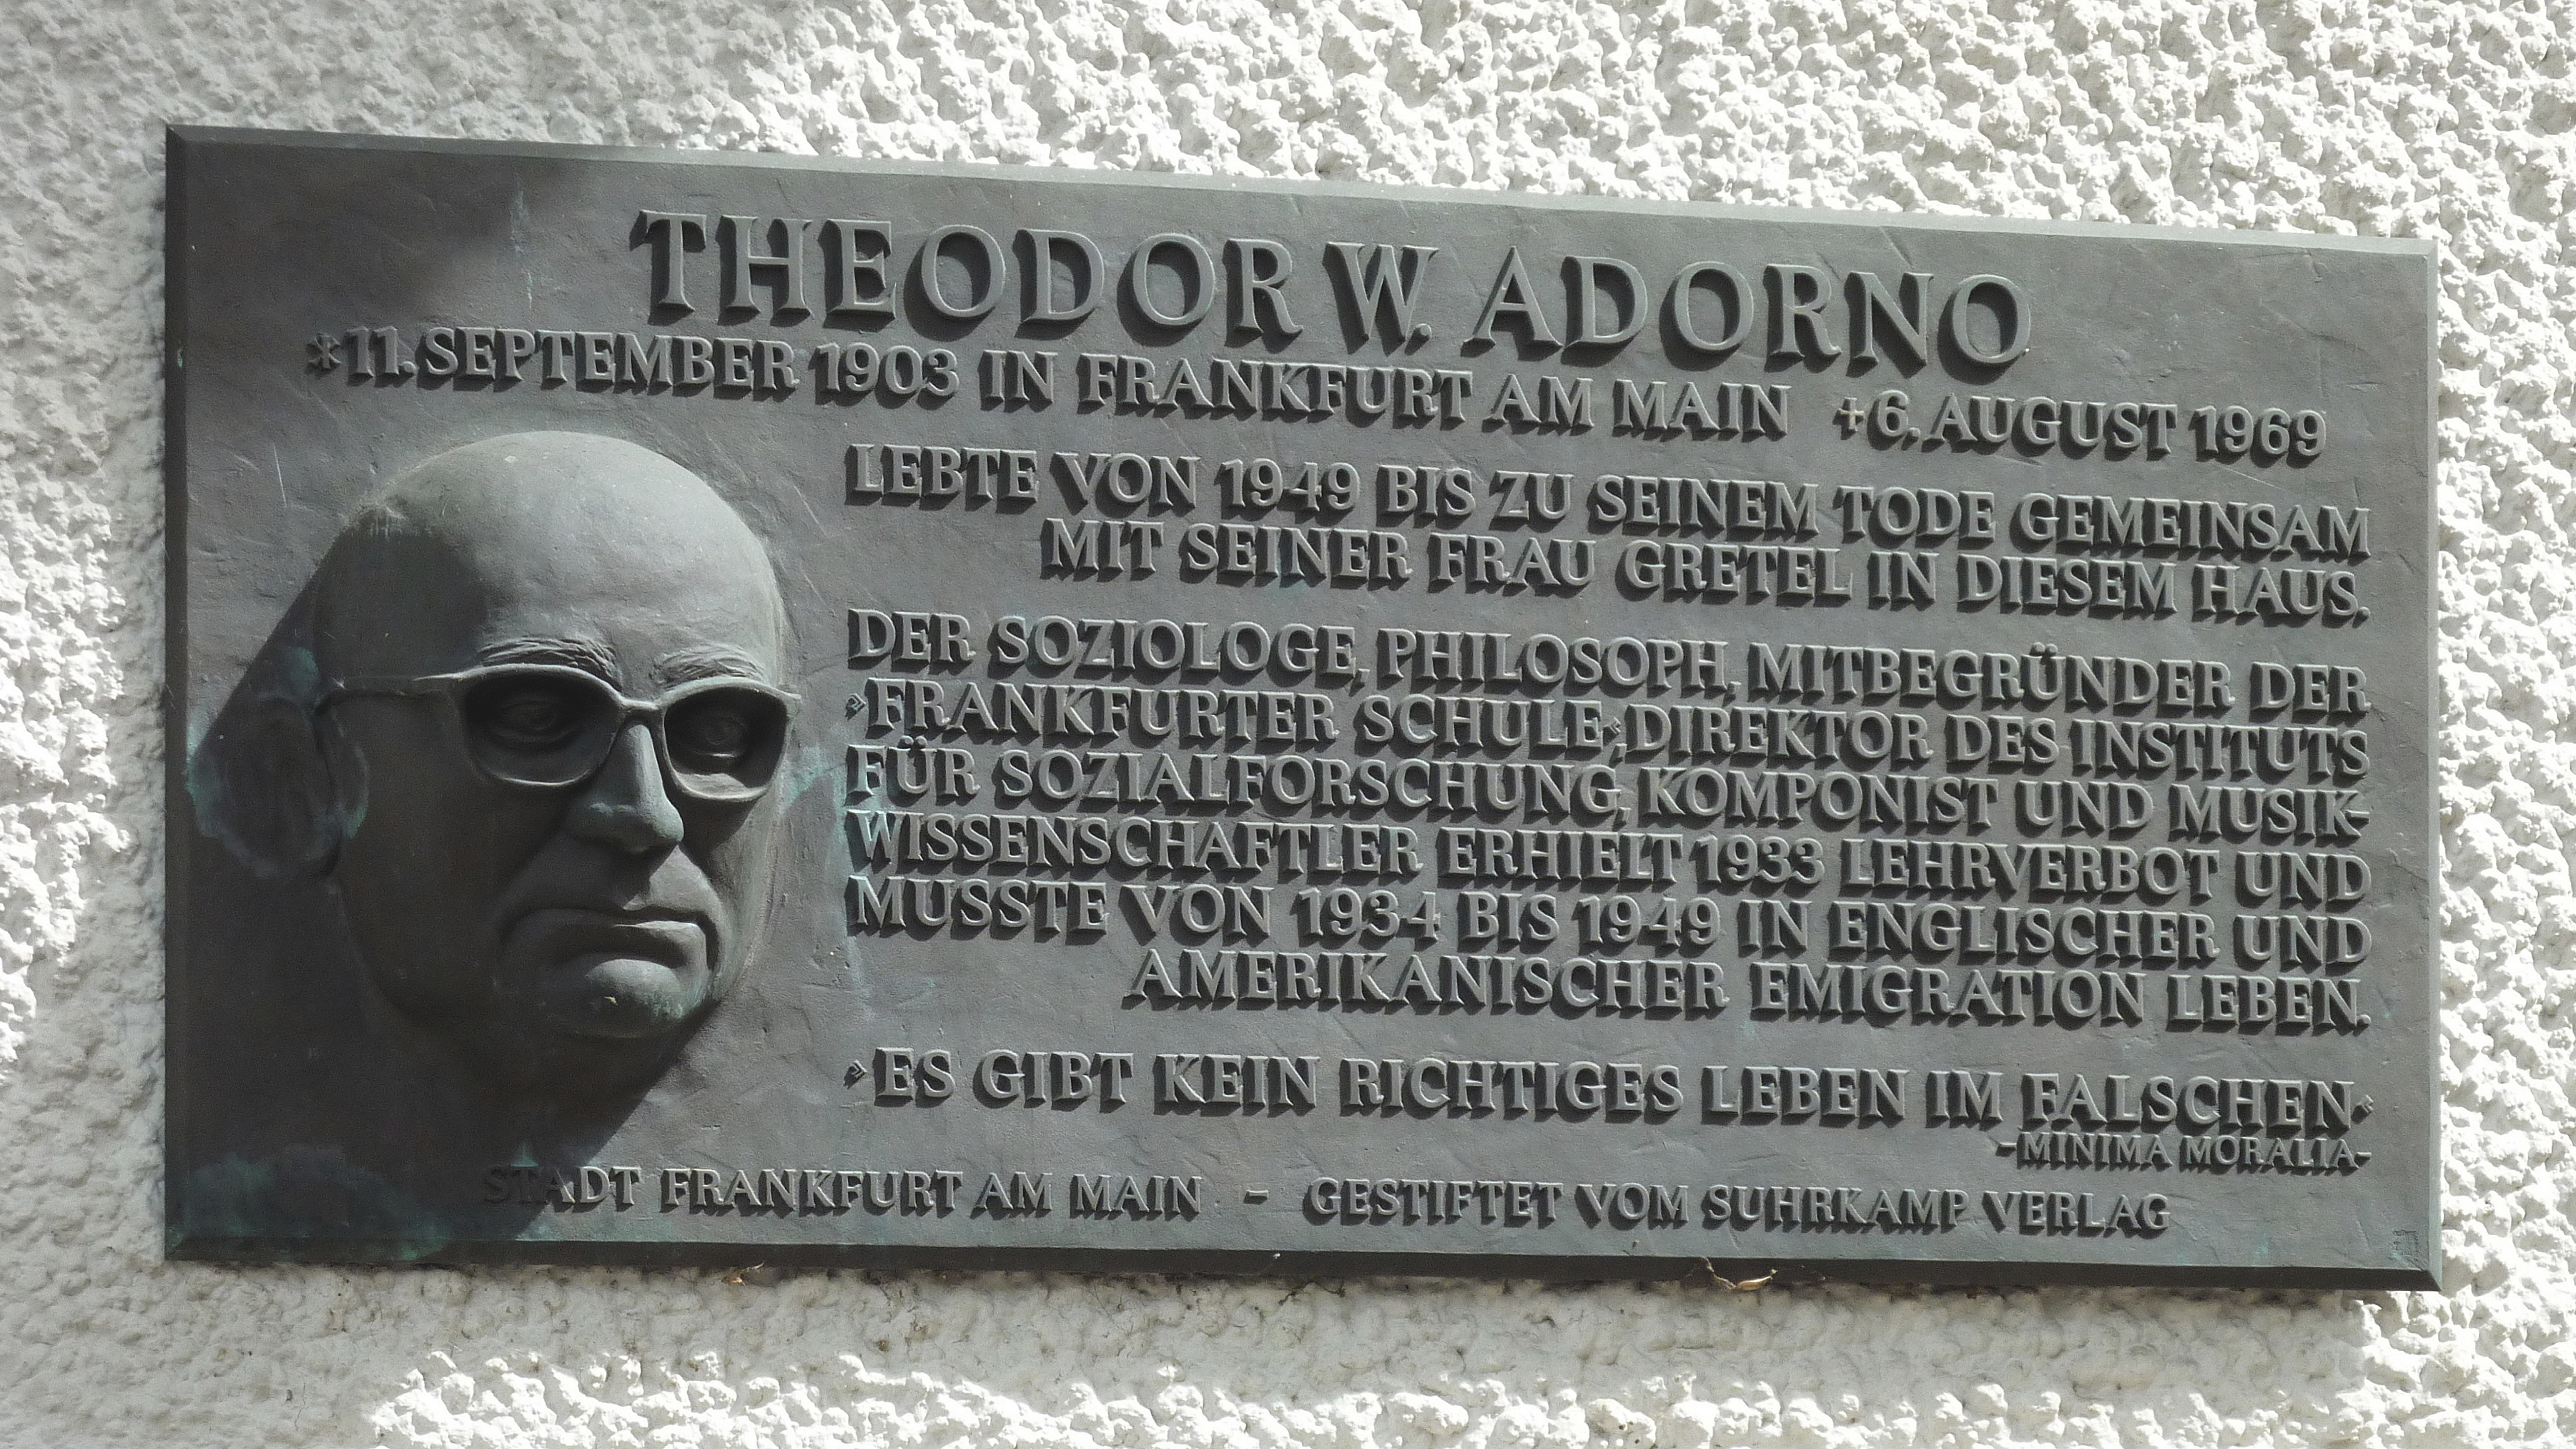 Теодор визенгрунд-адорно (wiesengrund-adorno) родился 11 сентября 1903 года во франкфурте-на-майне